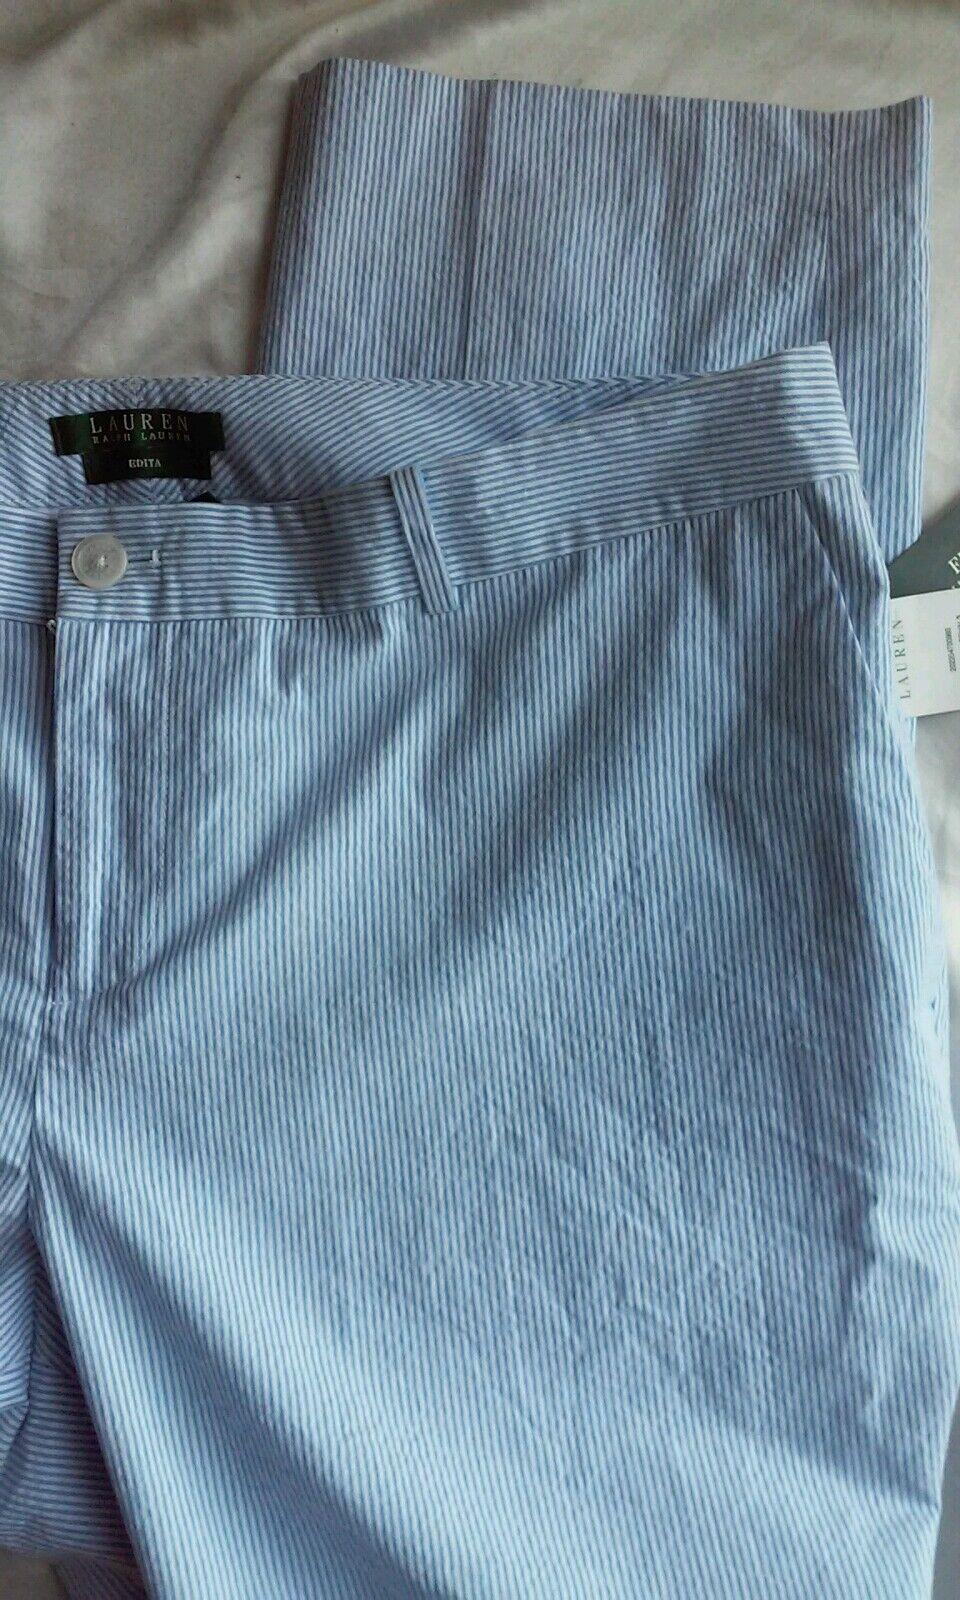 LAUREN RALPH LAUREN Edita Blau Pinstripe Dress Pants Trousers Sz14W Nwt